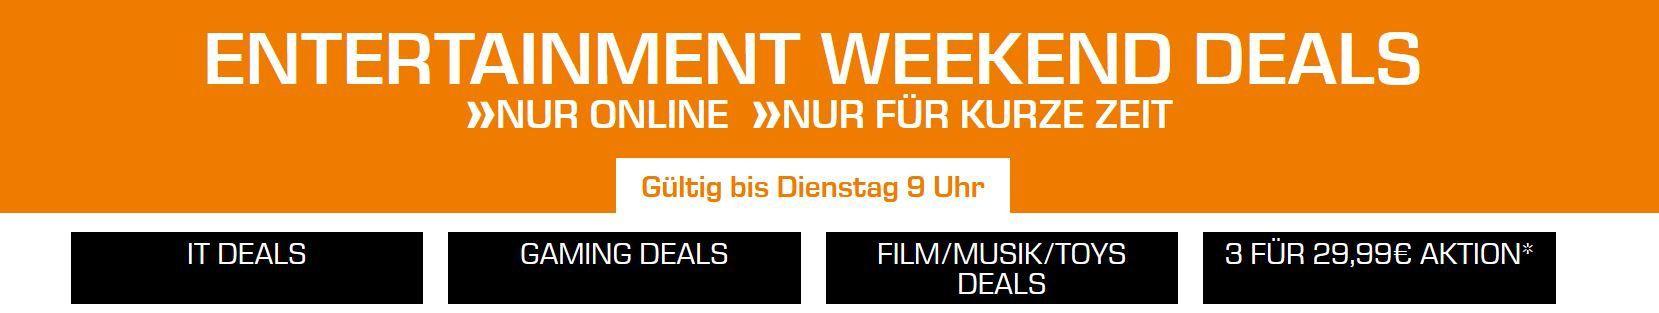 TOP! Saturn Entertainment Weekend Deals   z.B.  Royole   Moon black Video Brille ab 515€ (statt 645€)